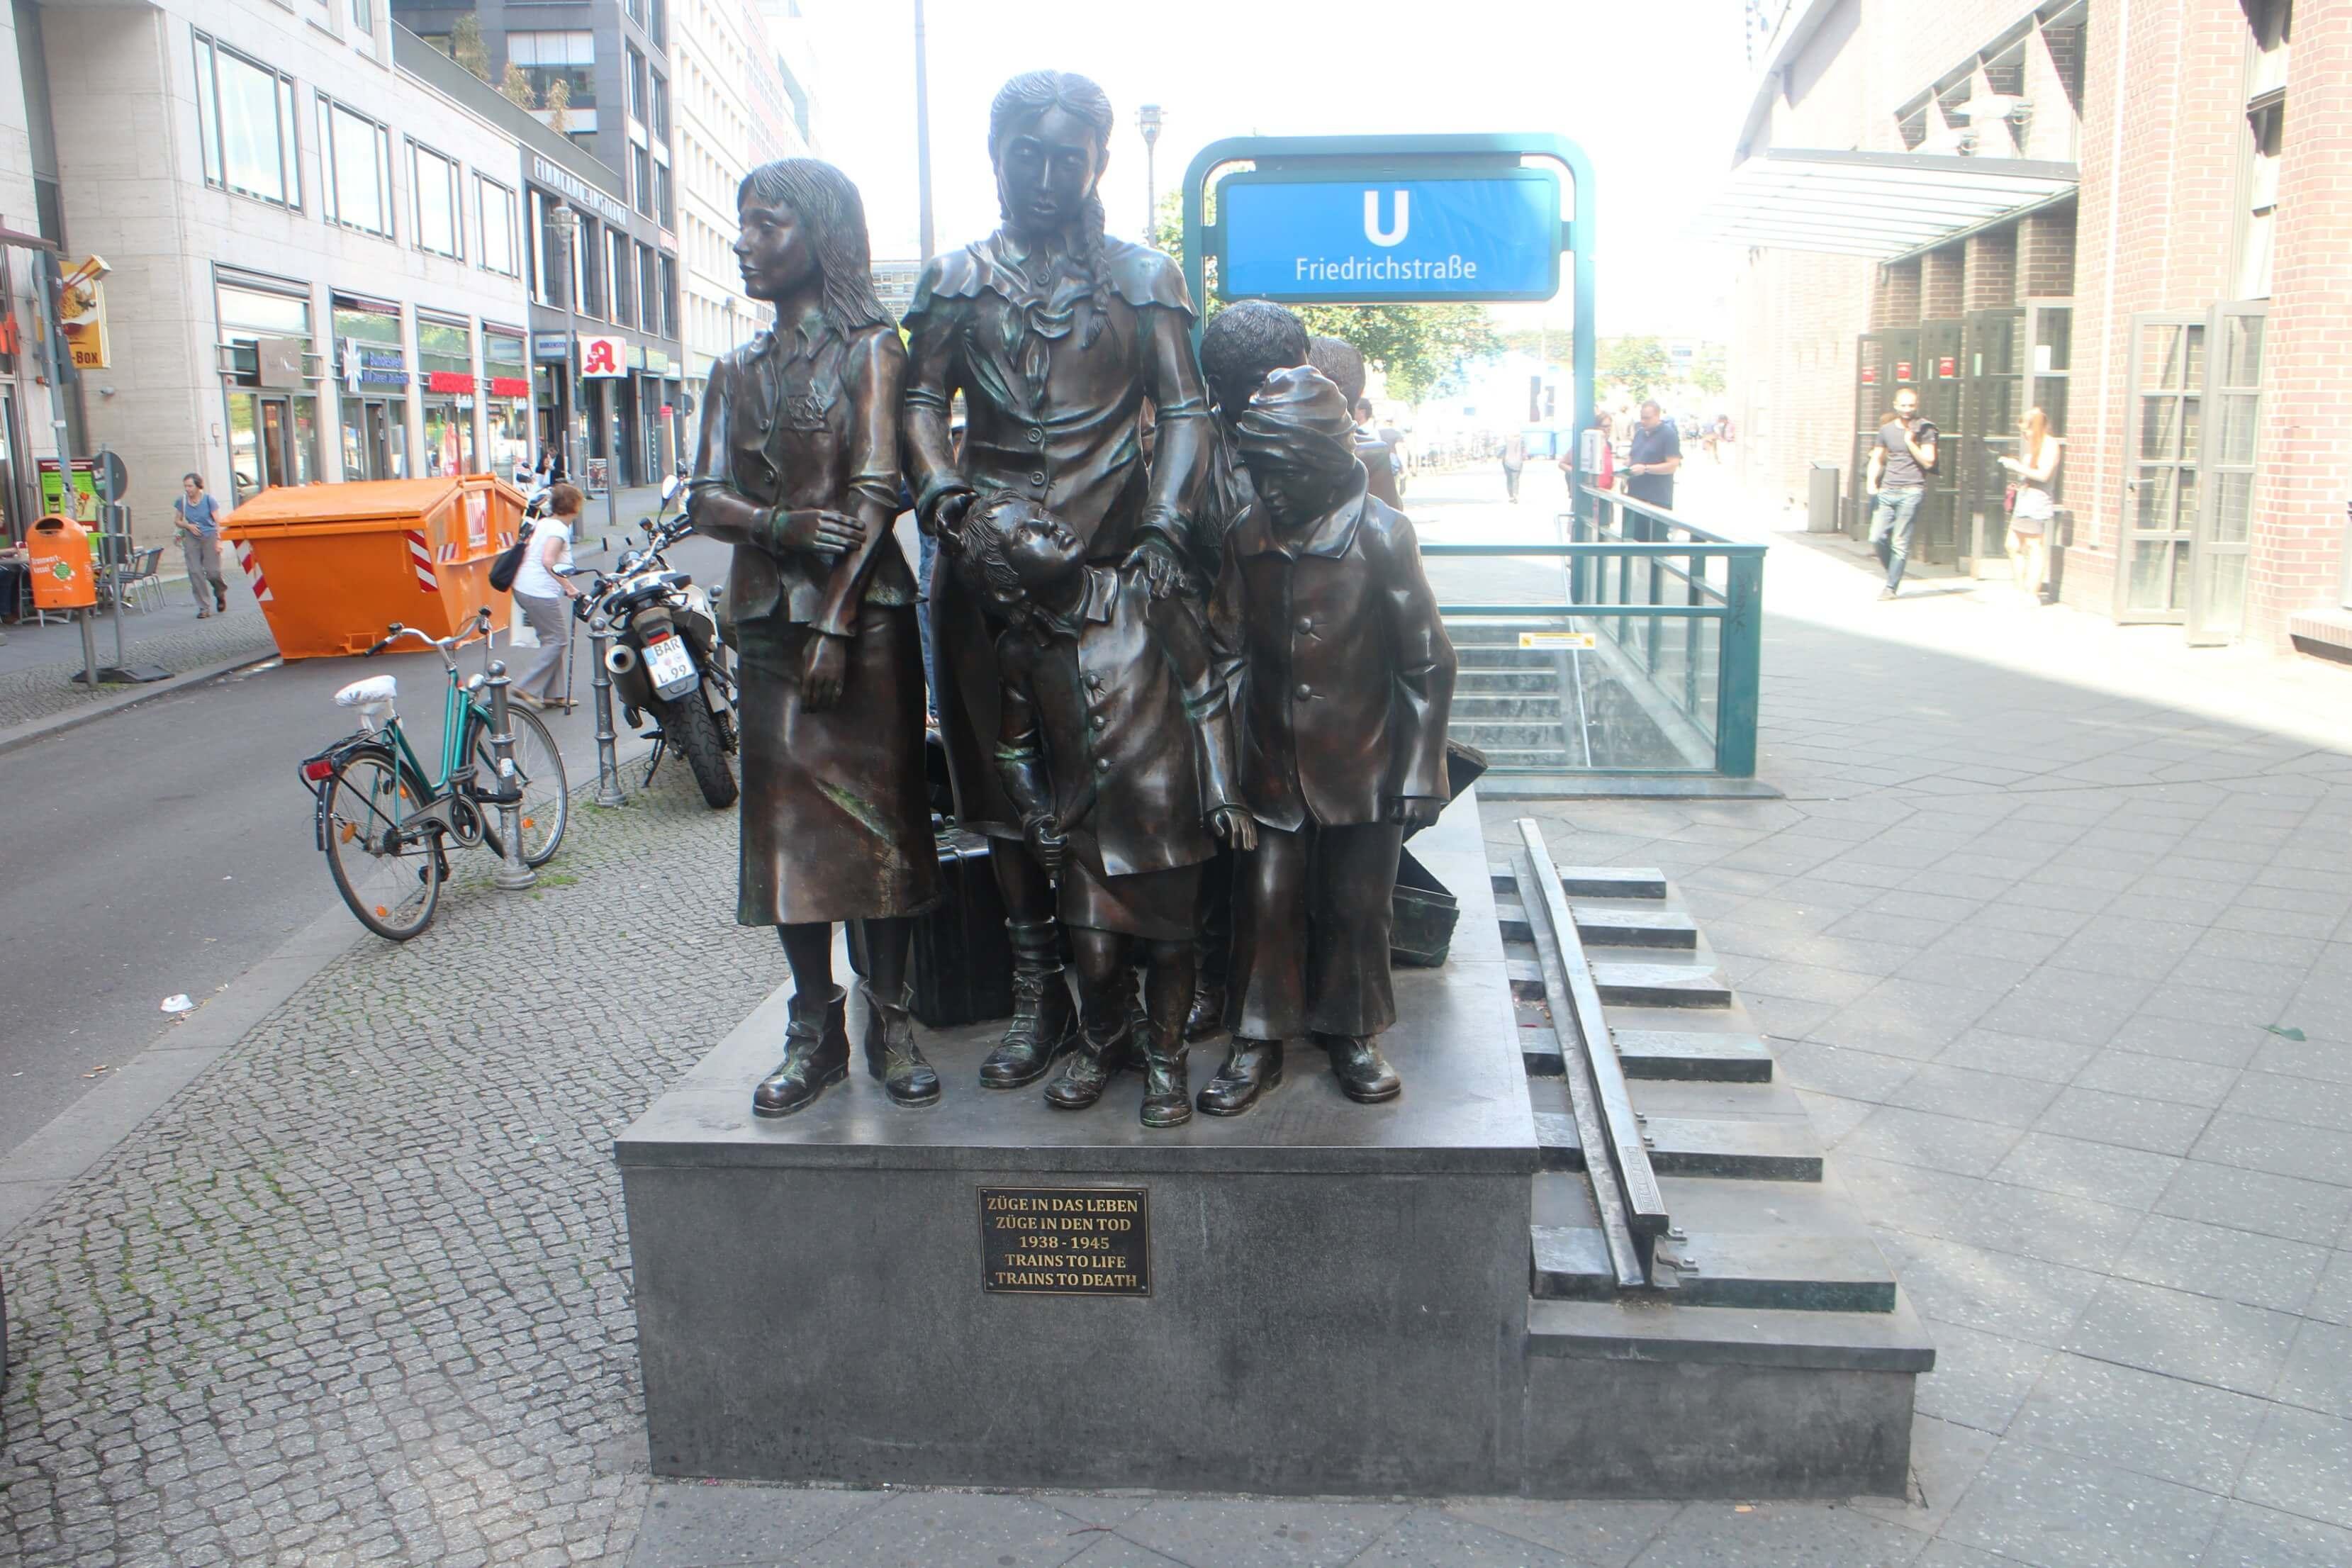 denkmal-trains-to-life-trains-to-death-berlijn